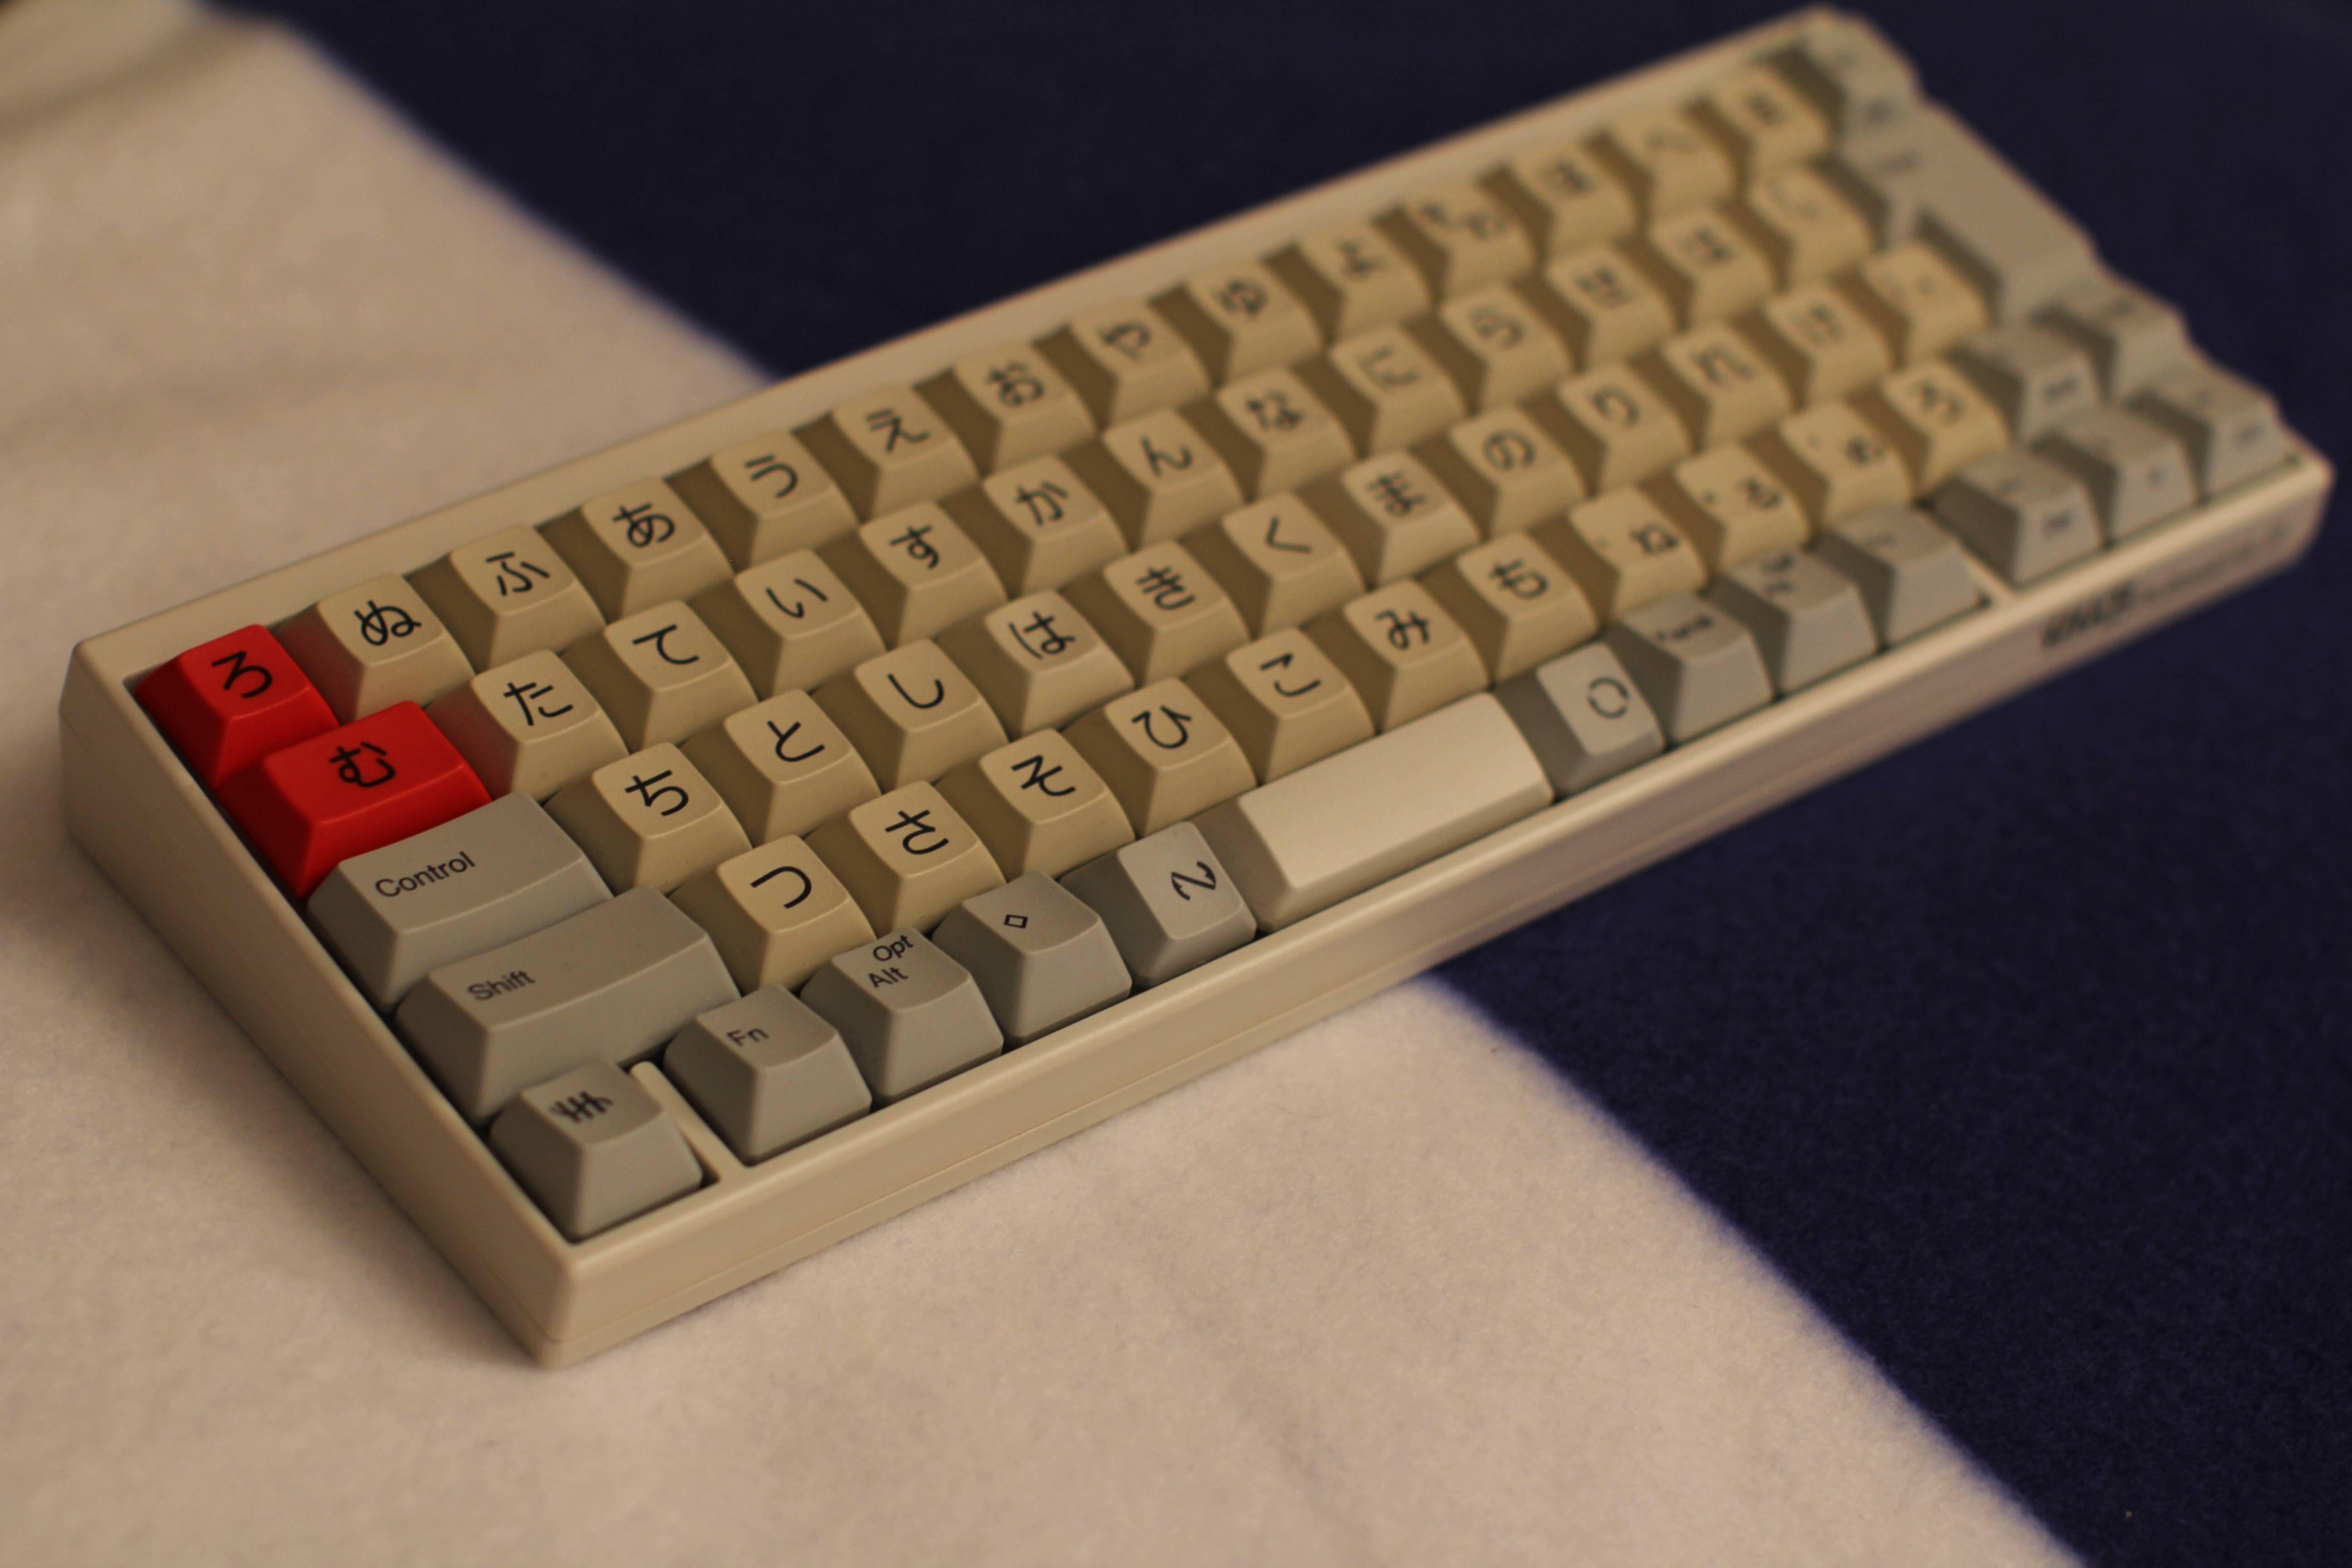 Hhkb With Dsa Otaku Old Japanese Sysadmin Pc Keyboard Otaku